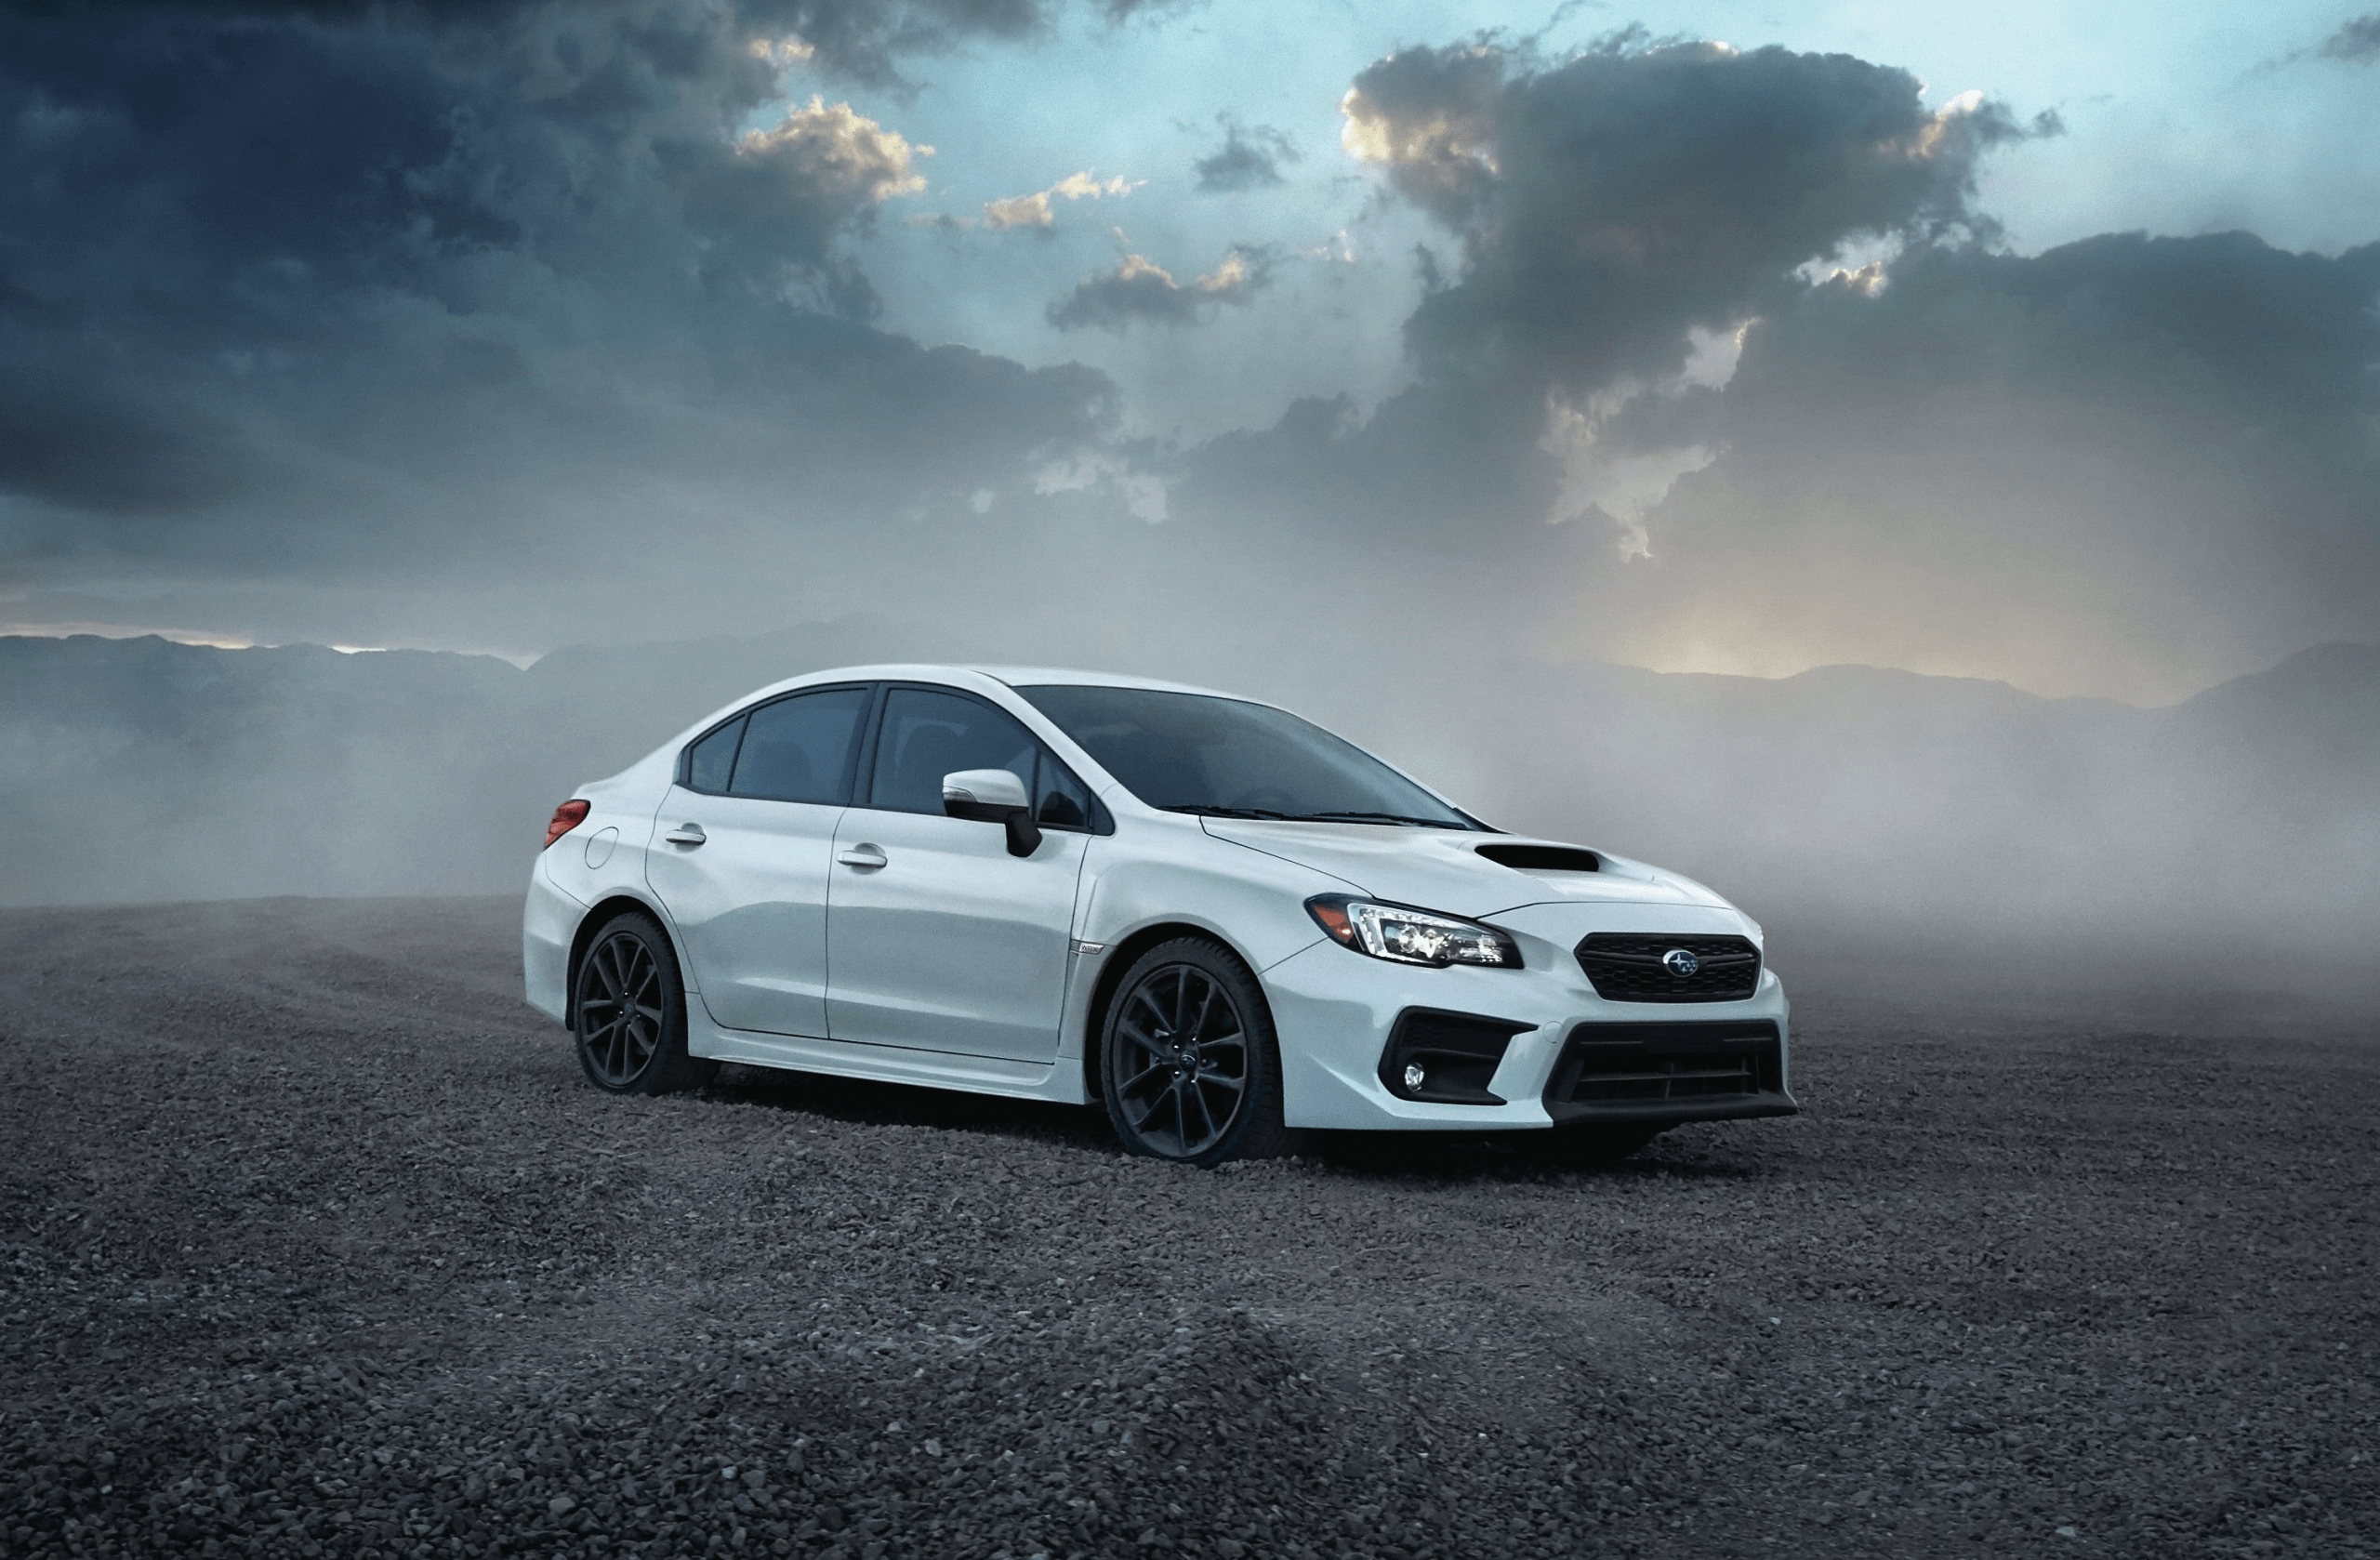 2021 Subaru Crosstrek Configurations In 2020 Subaru Wrx Subaru Impreza Subaru